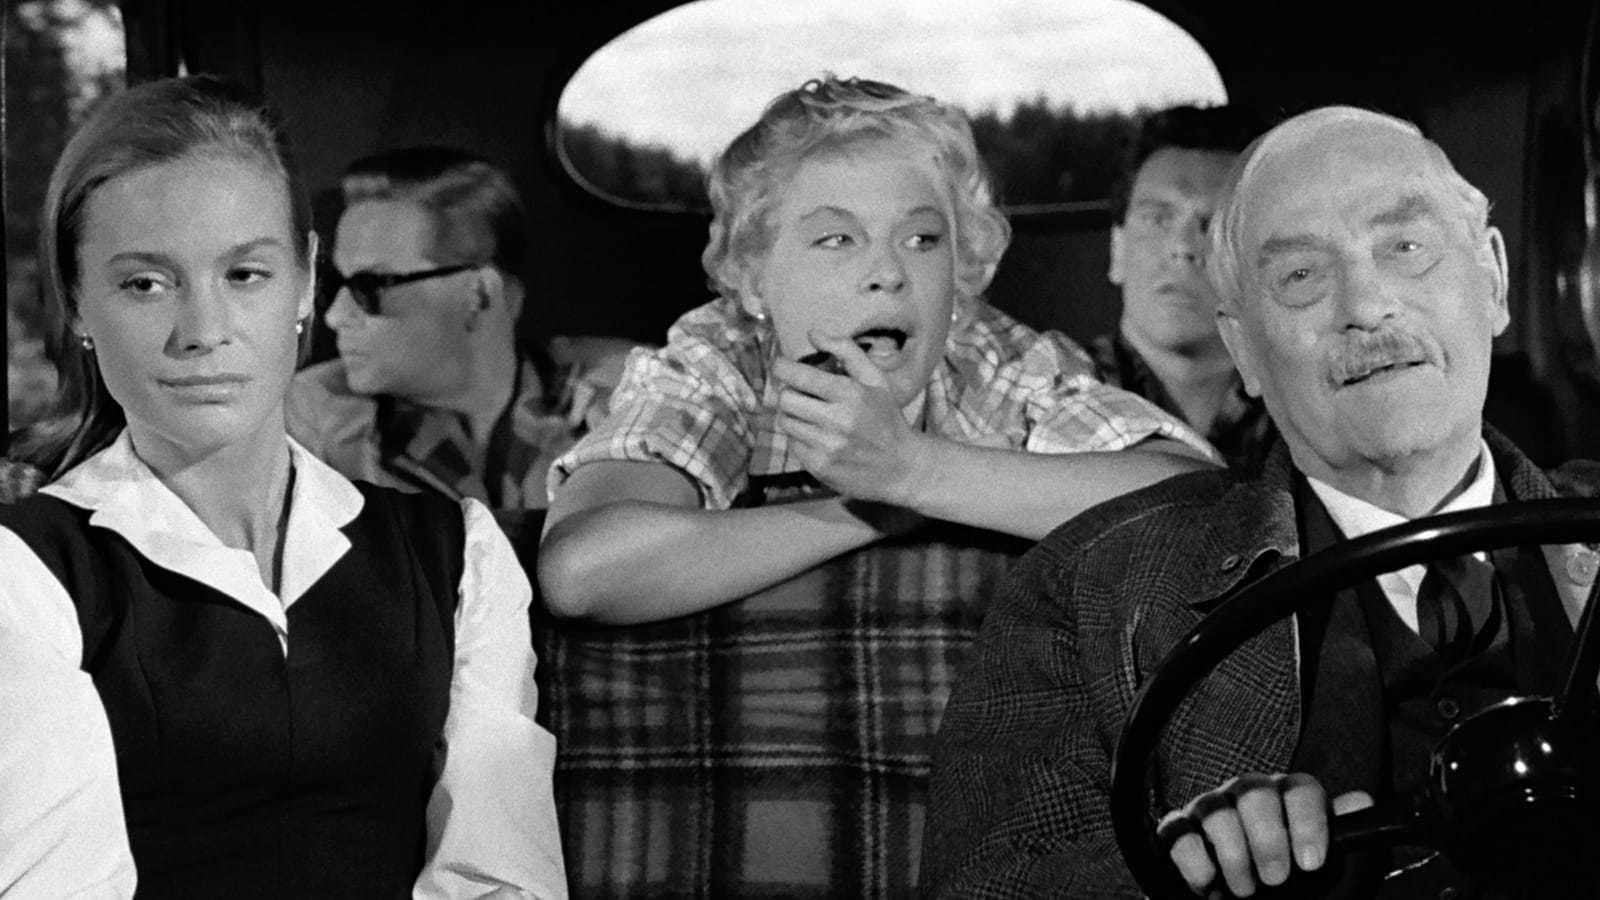 wild strawberries 1 - نقد فیلم Wild Strawberries (توت فرنگی های وحشی) محصول 1957